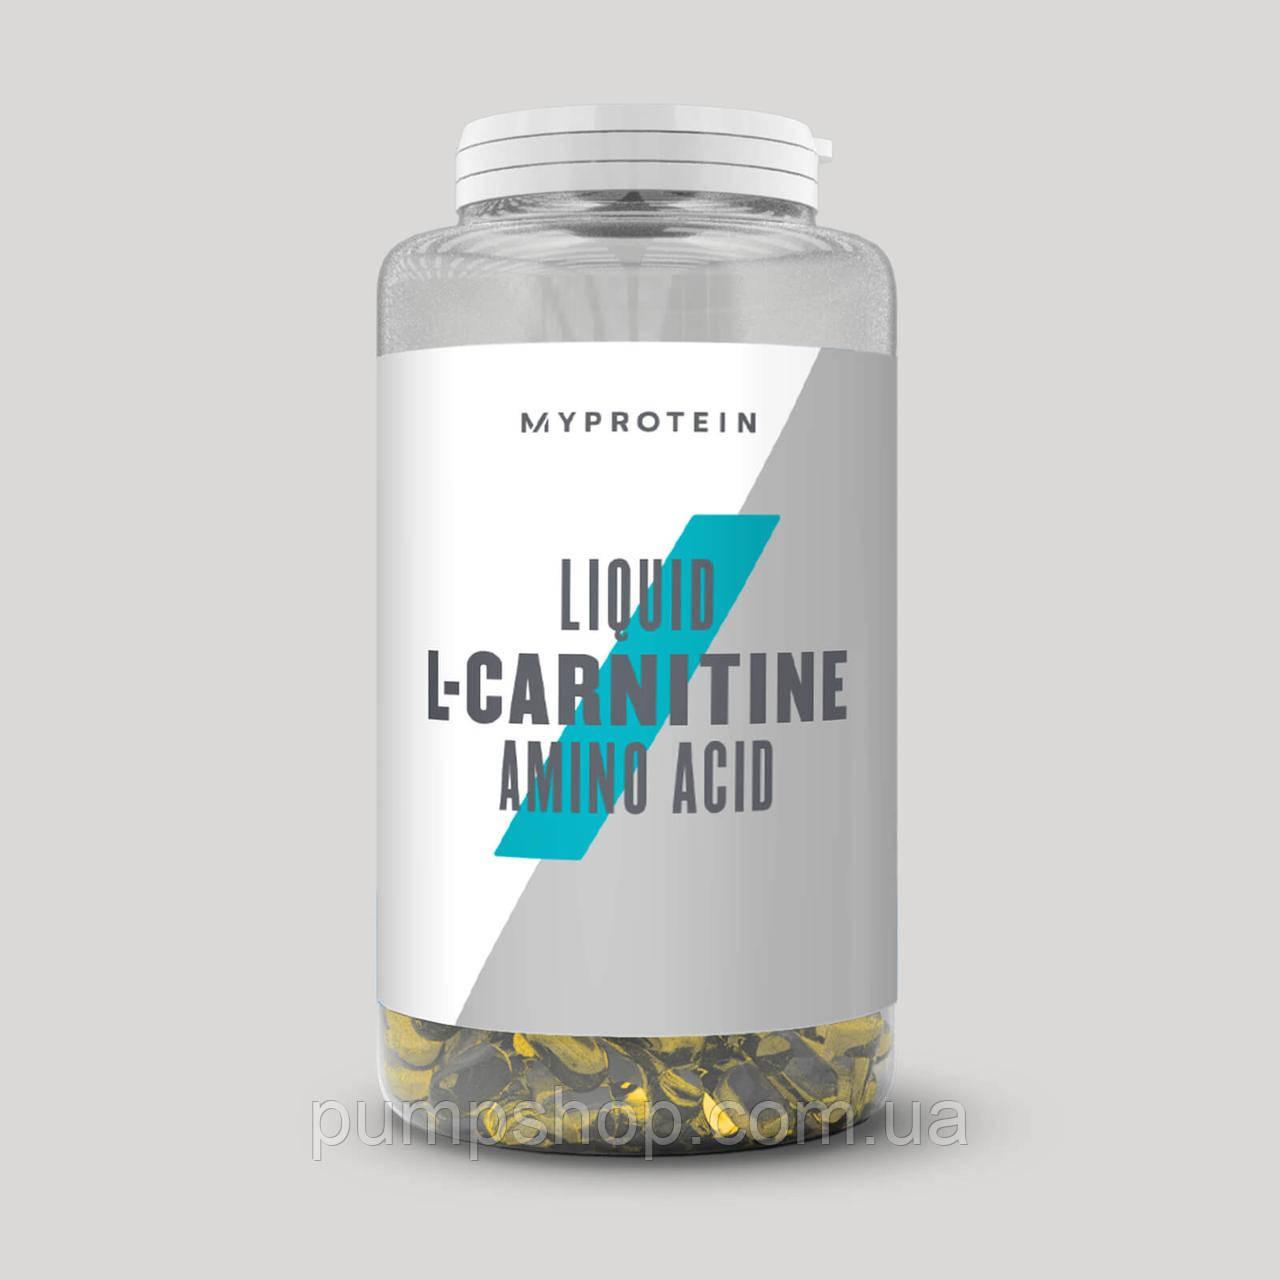 Л-карнитин жидкий в капсулах MyProtein Liquid L-carnitine 270 капс.(135 порций)